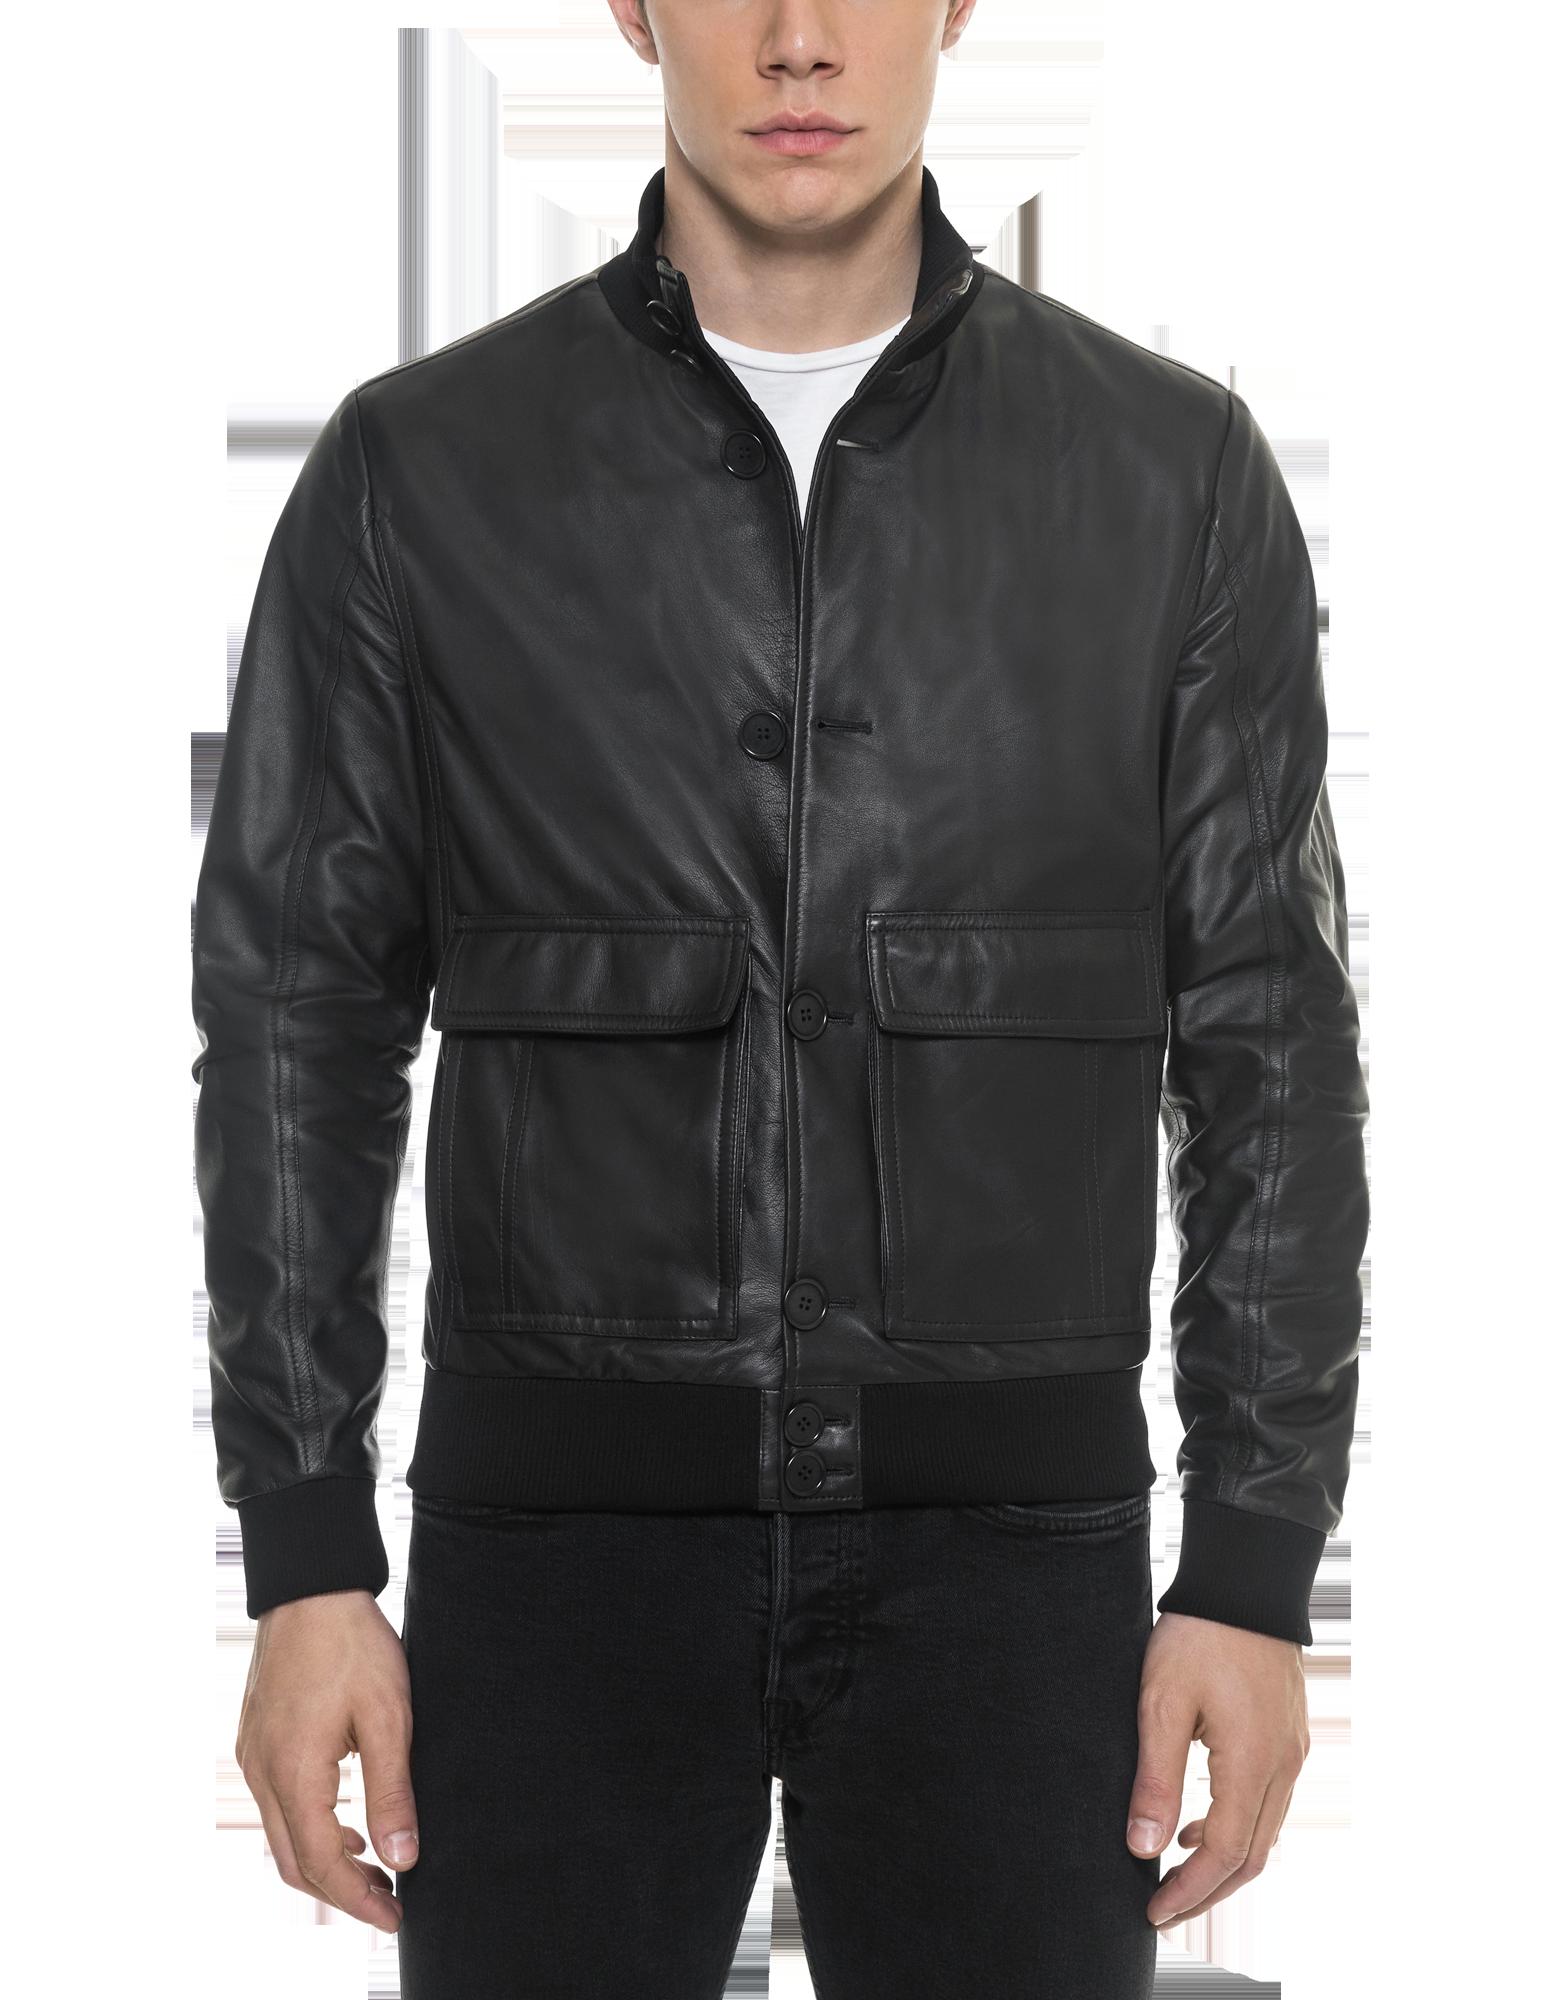 Image of Black Leather Men's Bomber Jacket